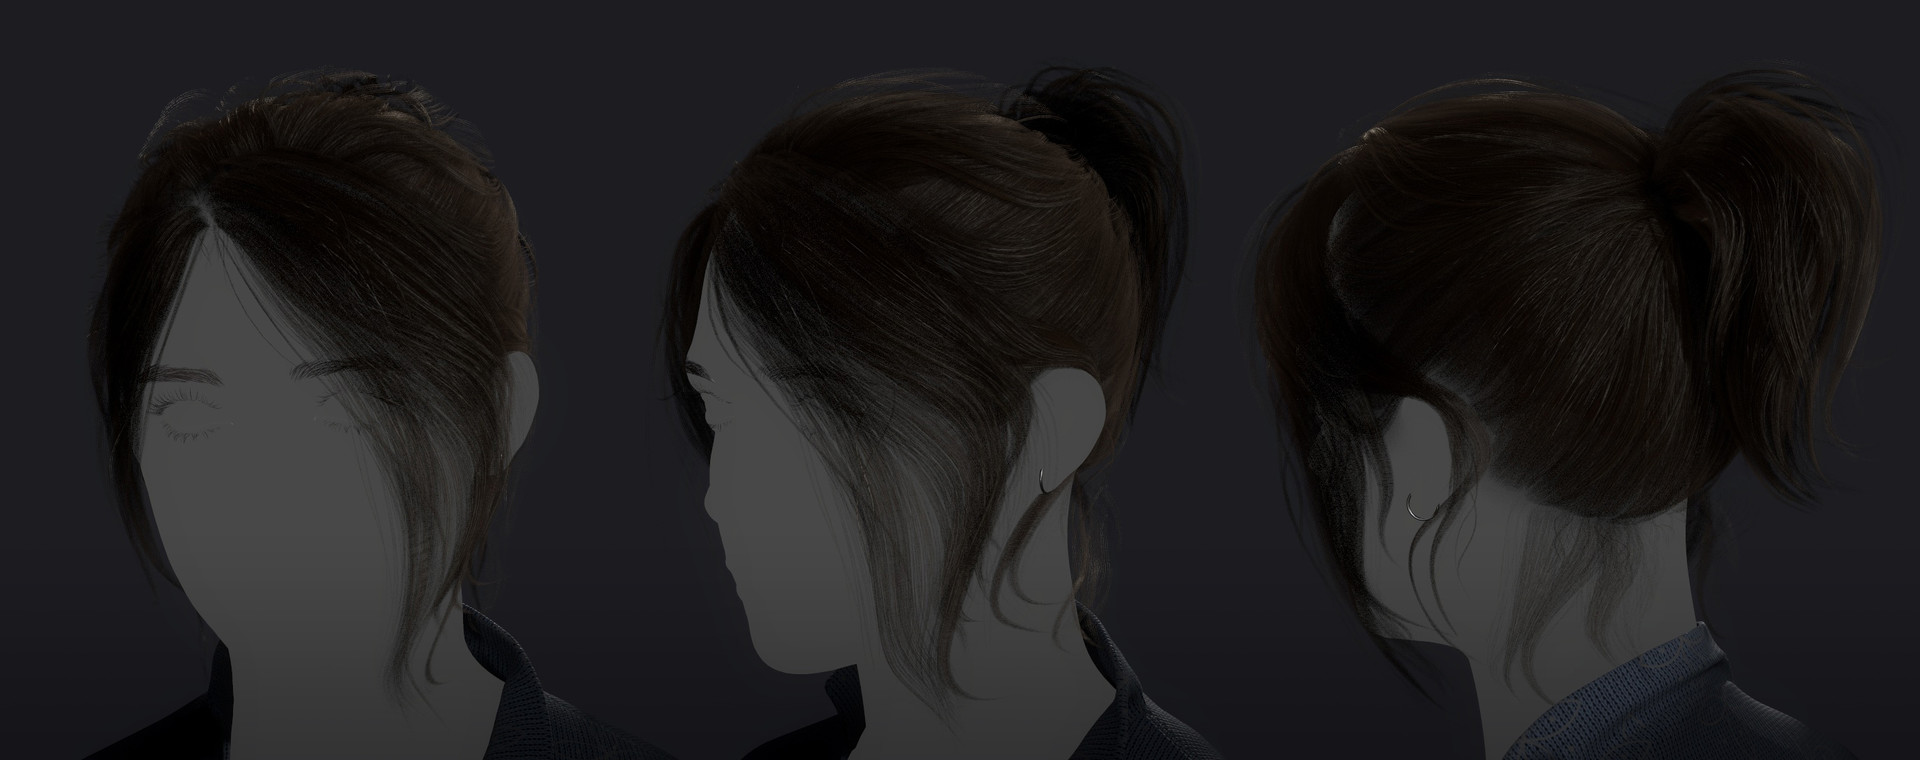 Saurabh jethani brunette 01